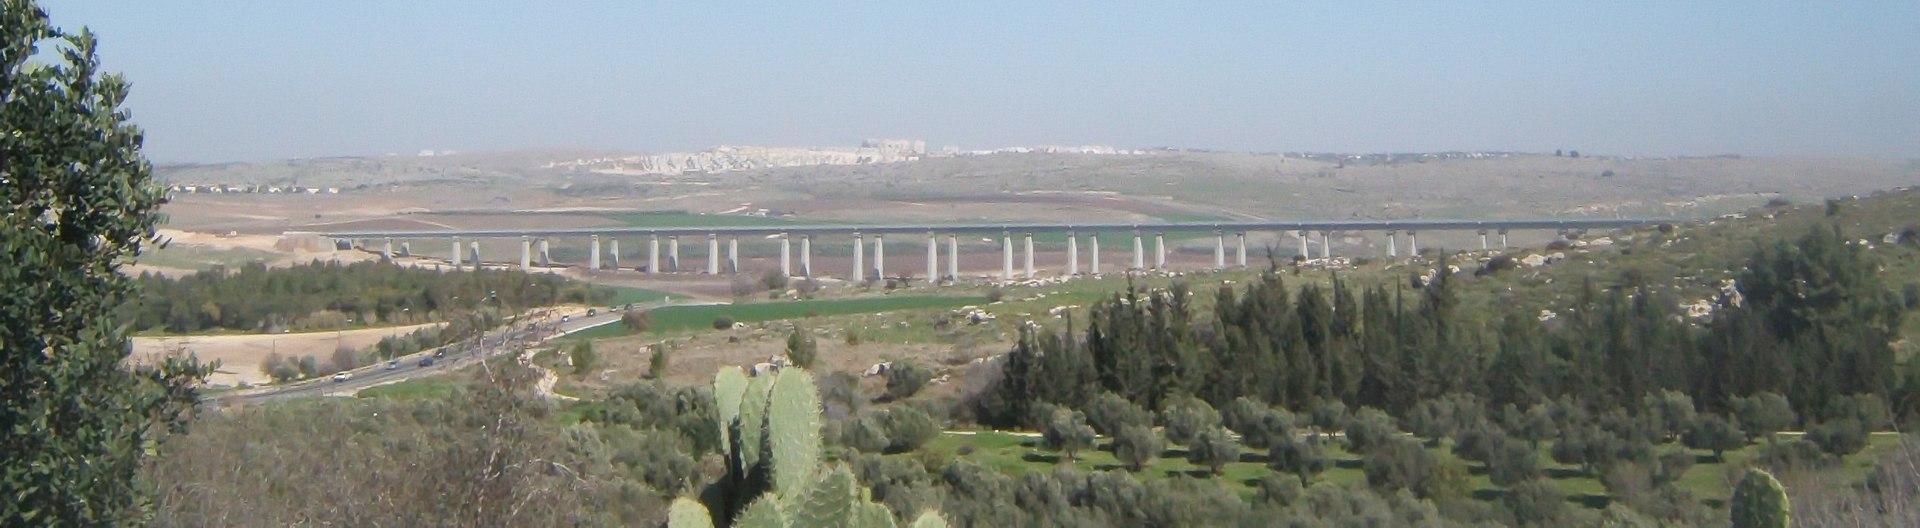 1920px-Modiin-Jerusalem_Railway_Bridge6_